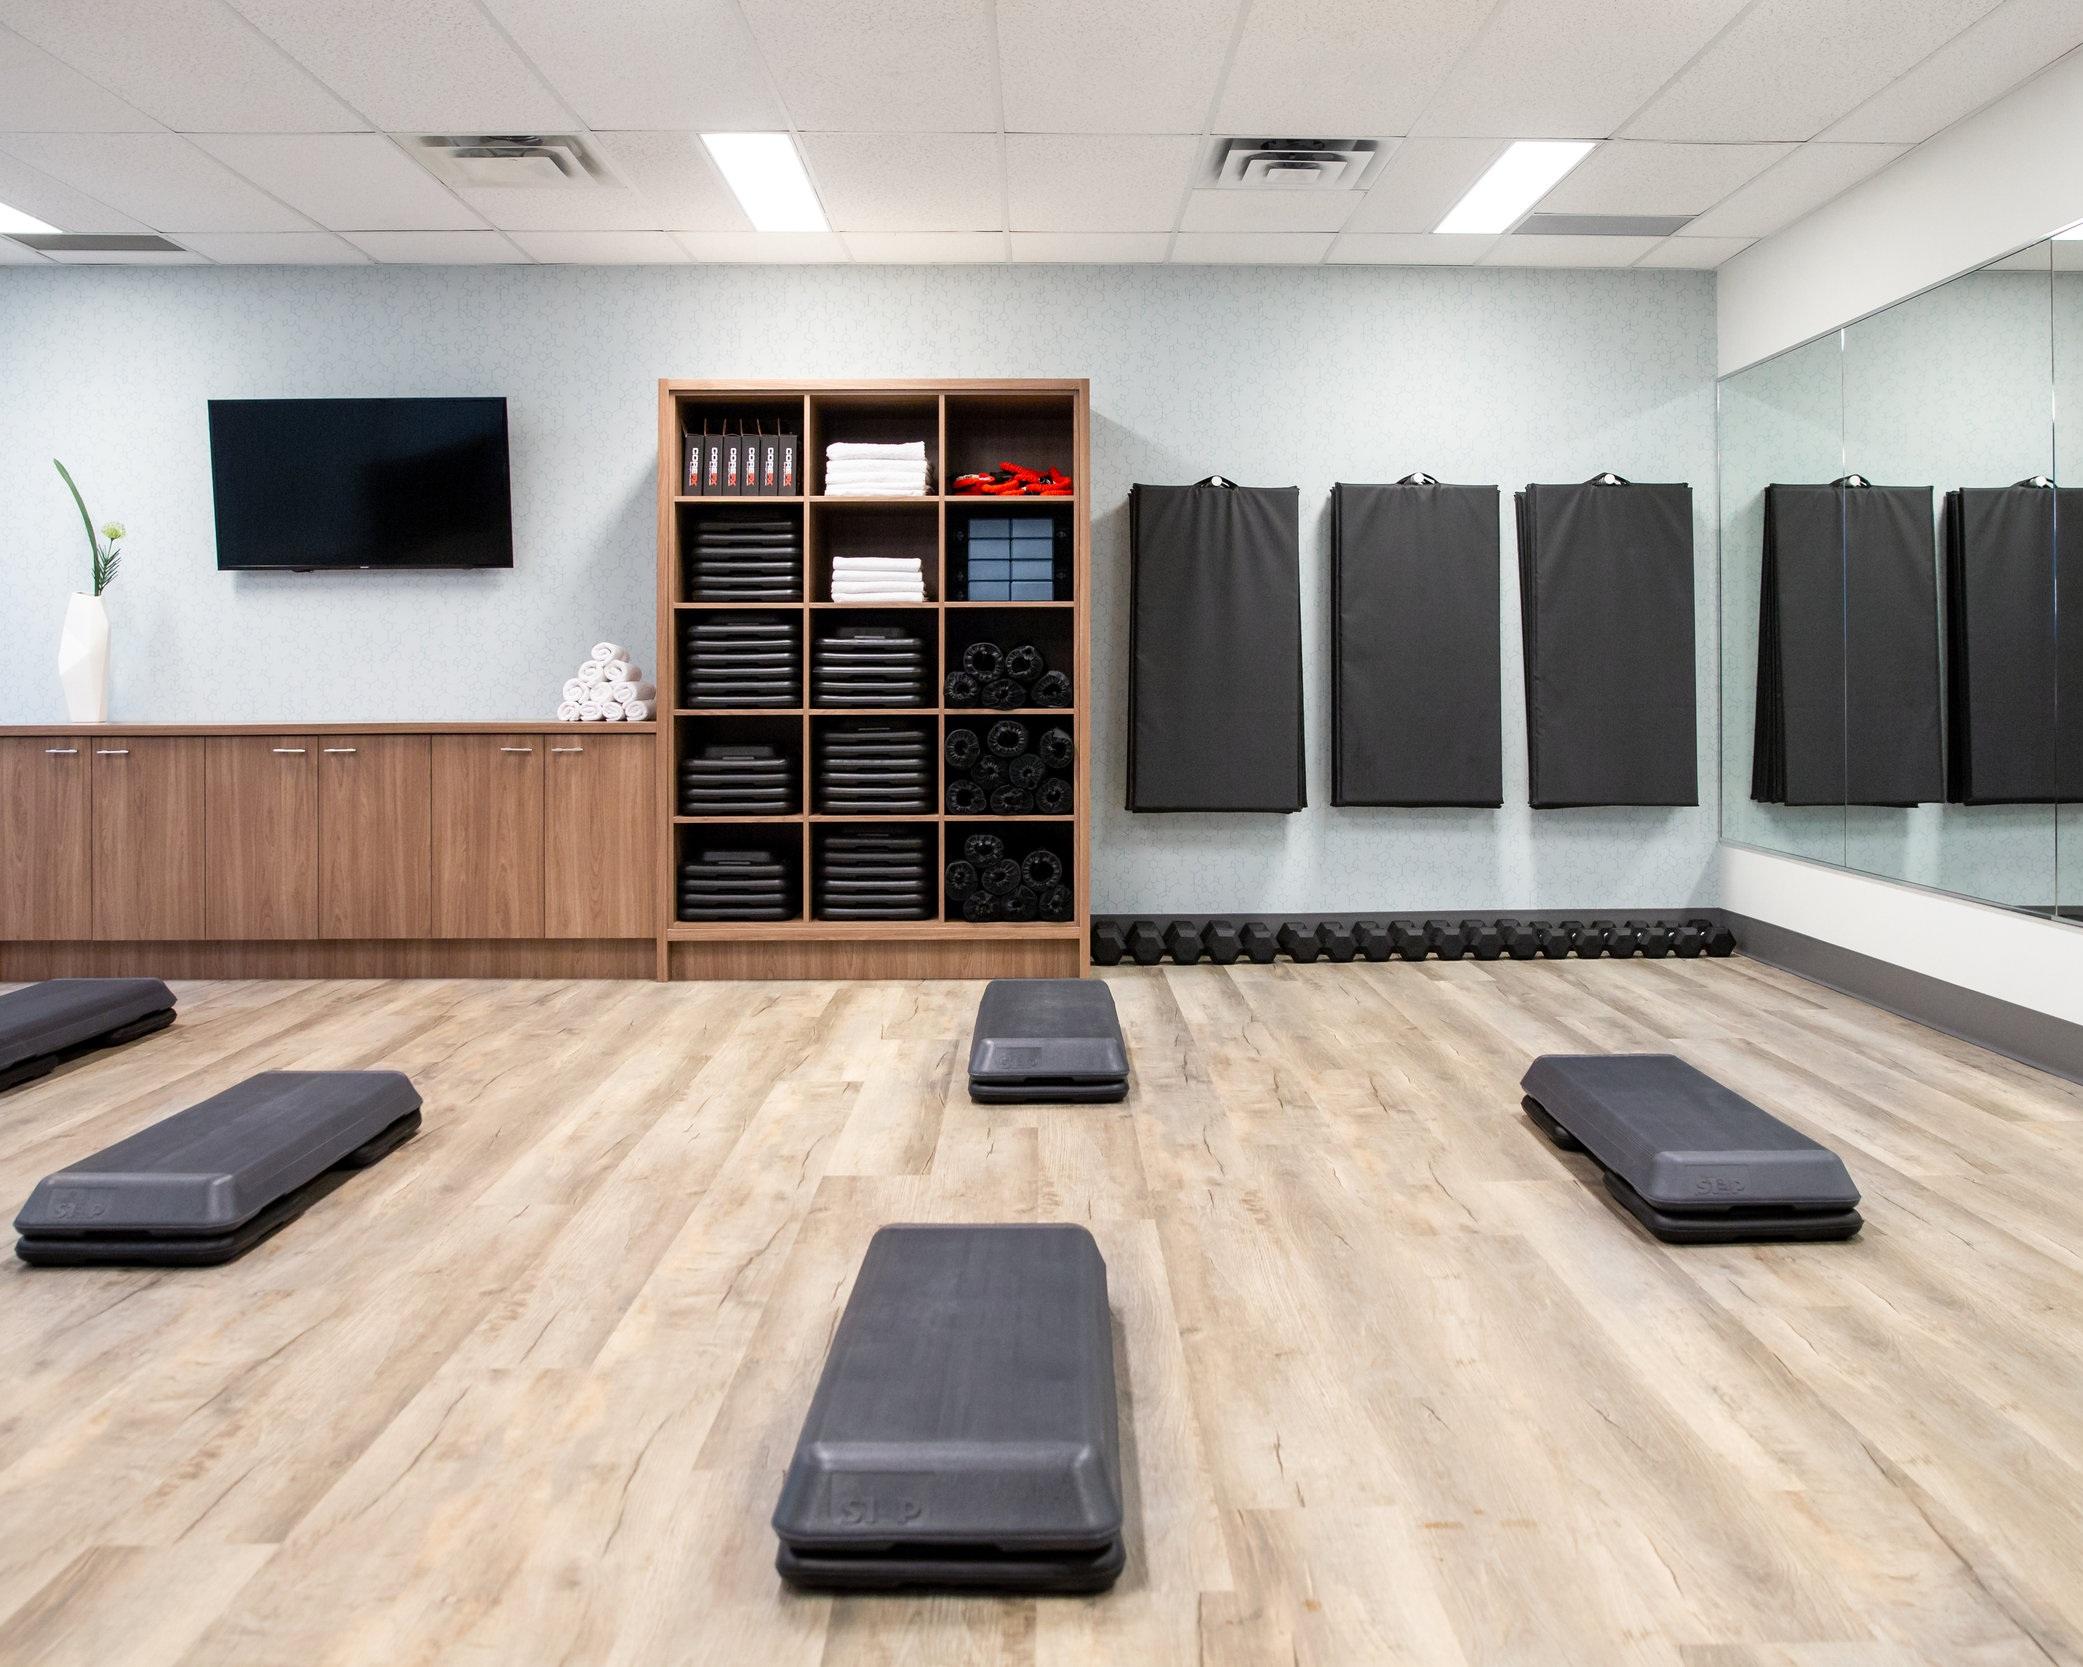 BLOCK-Commercial-Interior-Design-Calgary-Southland-Park-9.jpg